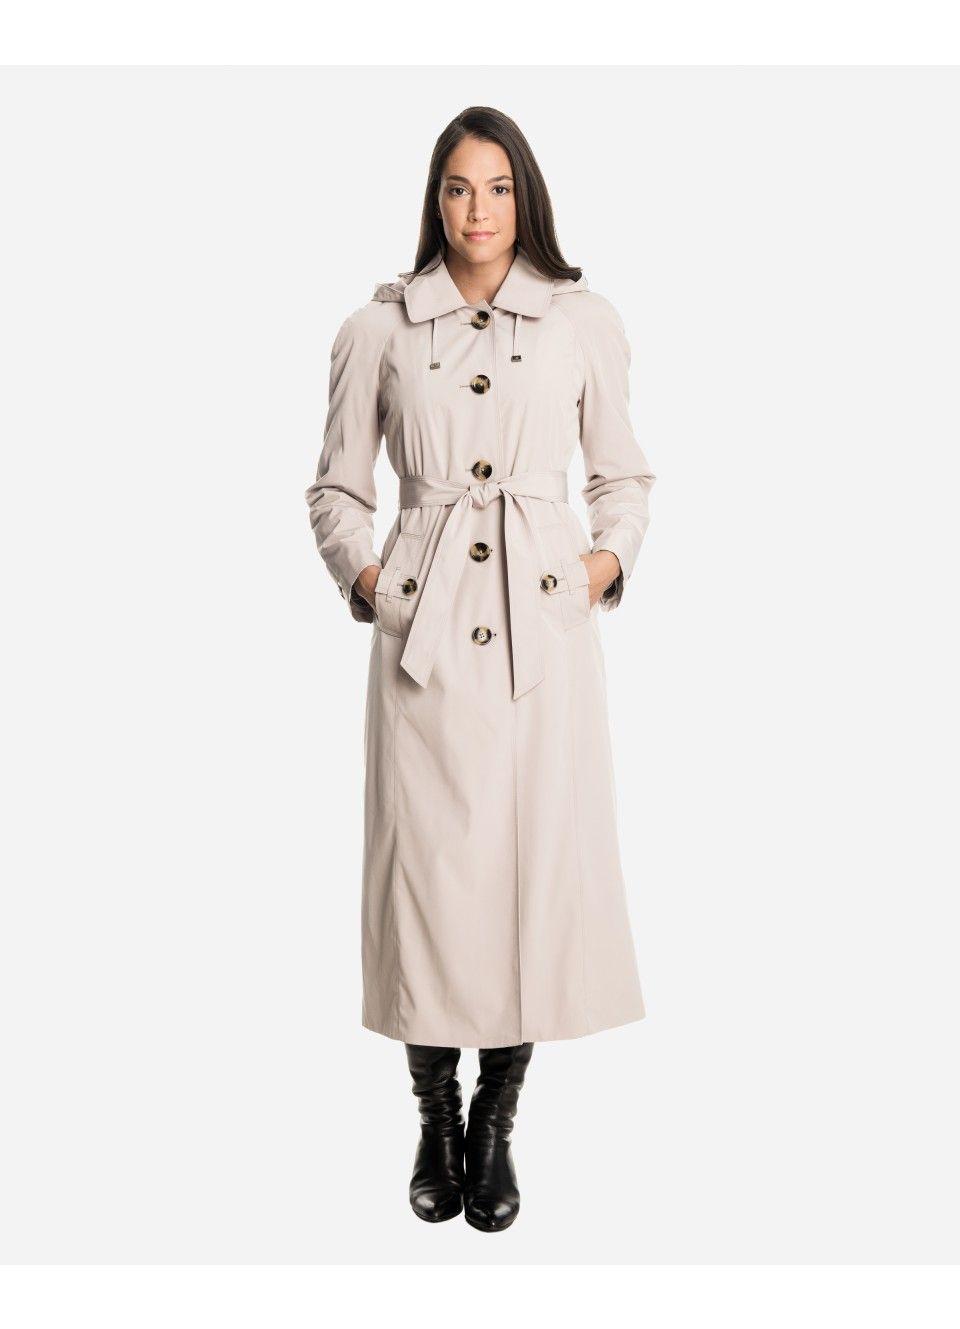 Sophia Women's Long Raincoat with Detachable Hood | London Fog: I wish it  came in